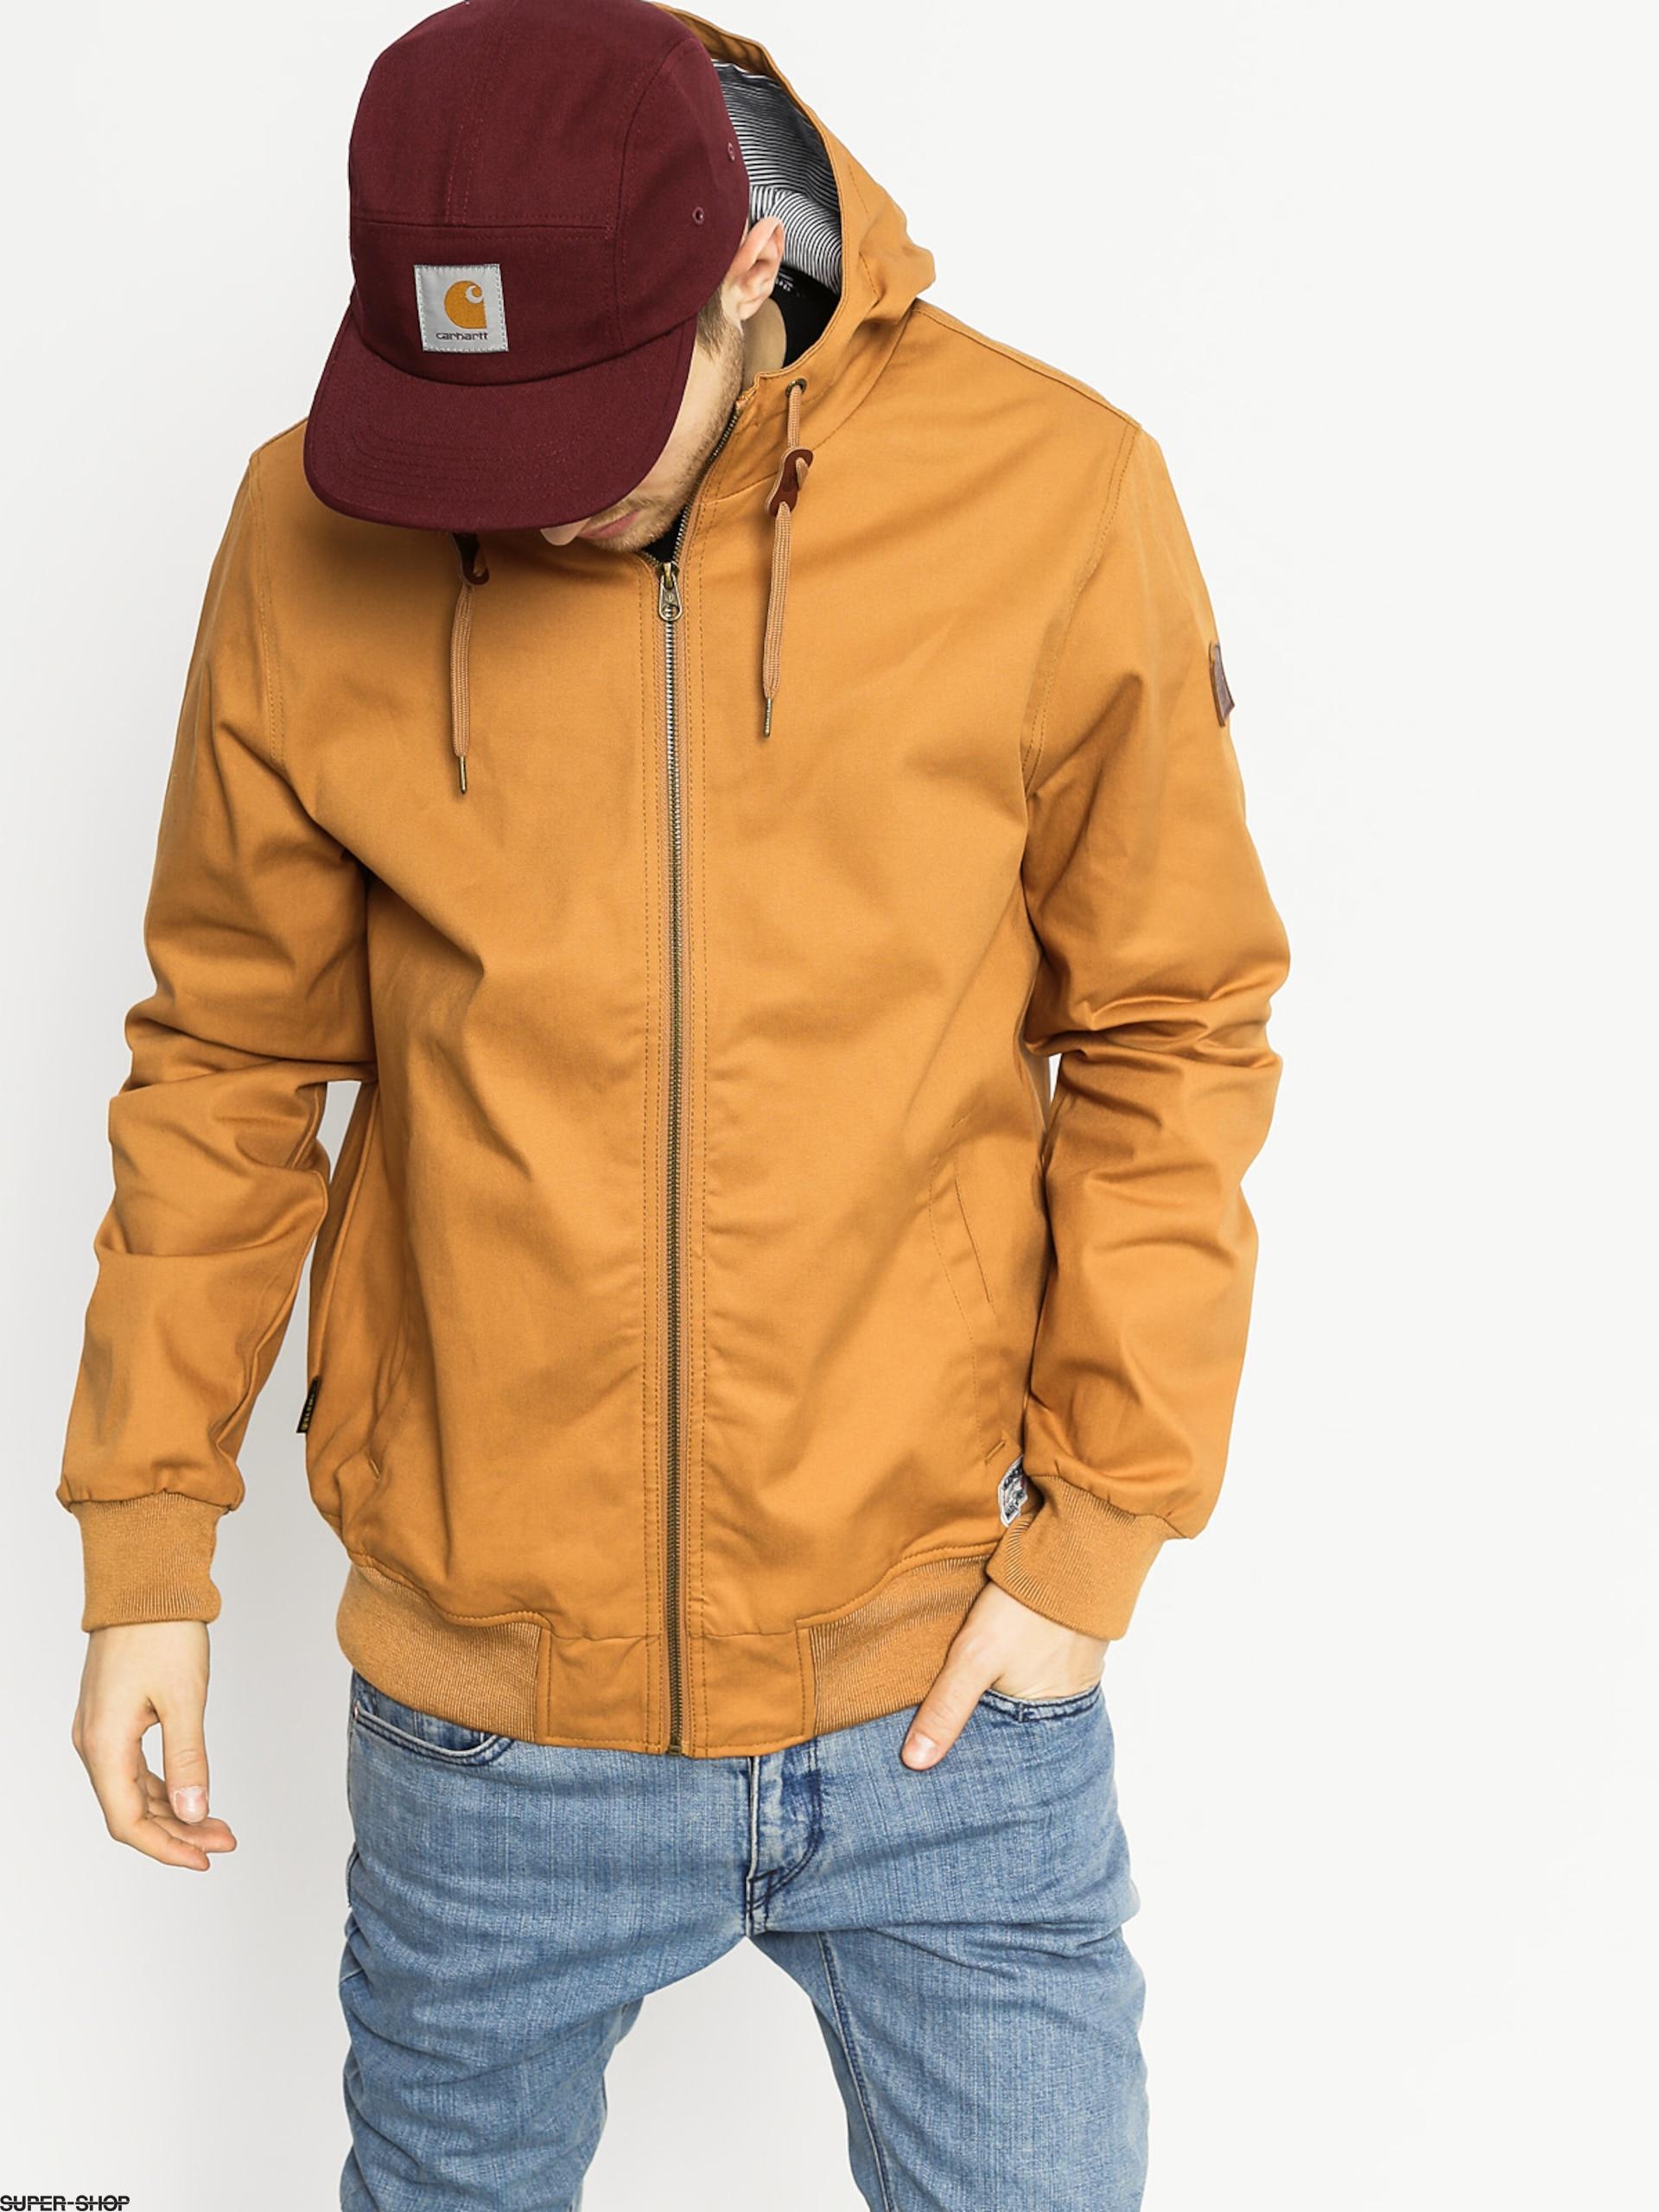 ELEMENT DULCEY HERREN Jacke Übergangsjacke rust brown C1JKA9